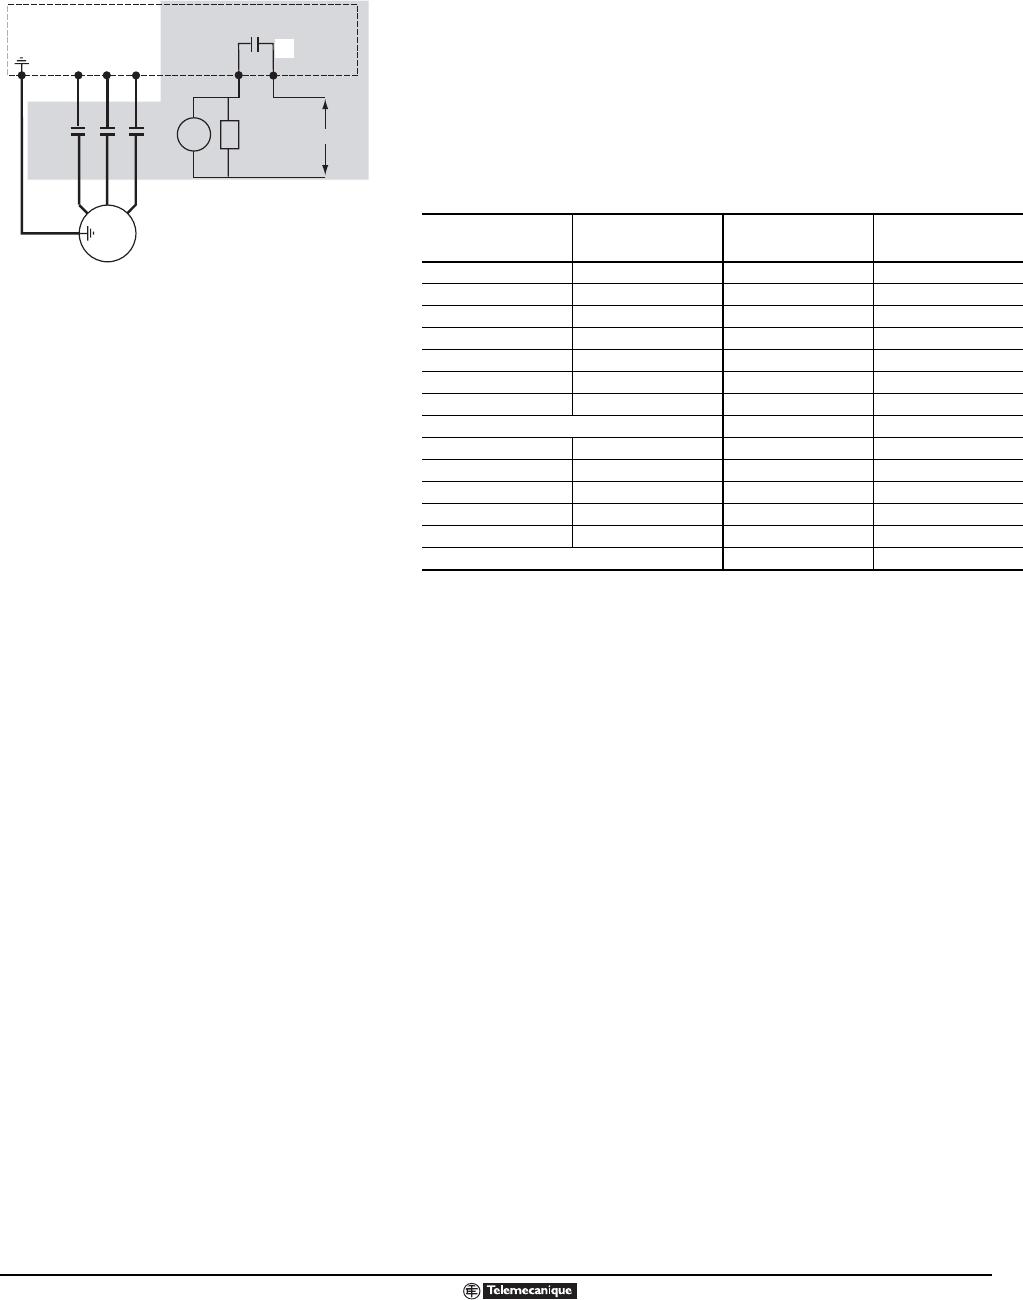 D32 Contactor Wiring Diagram